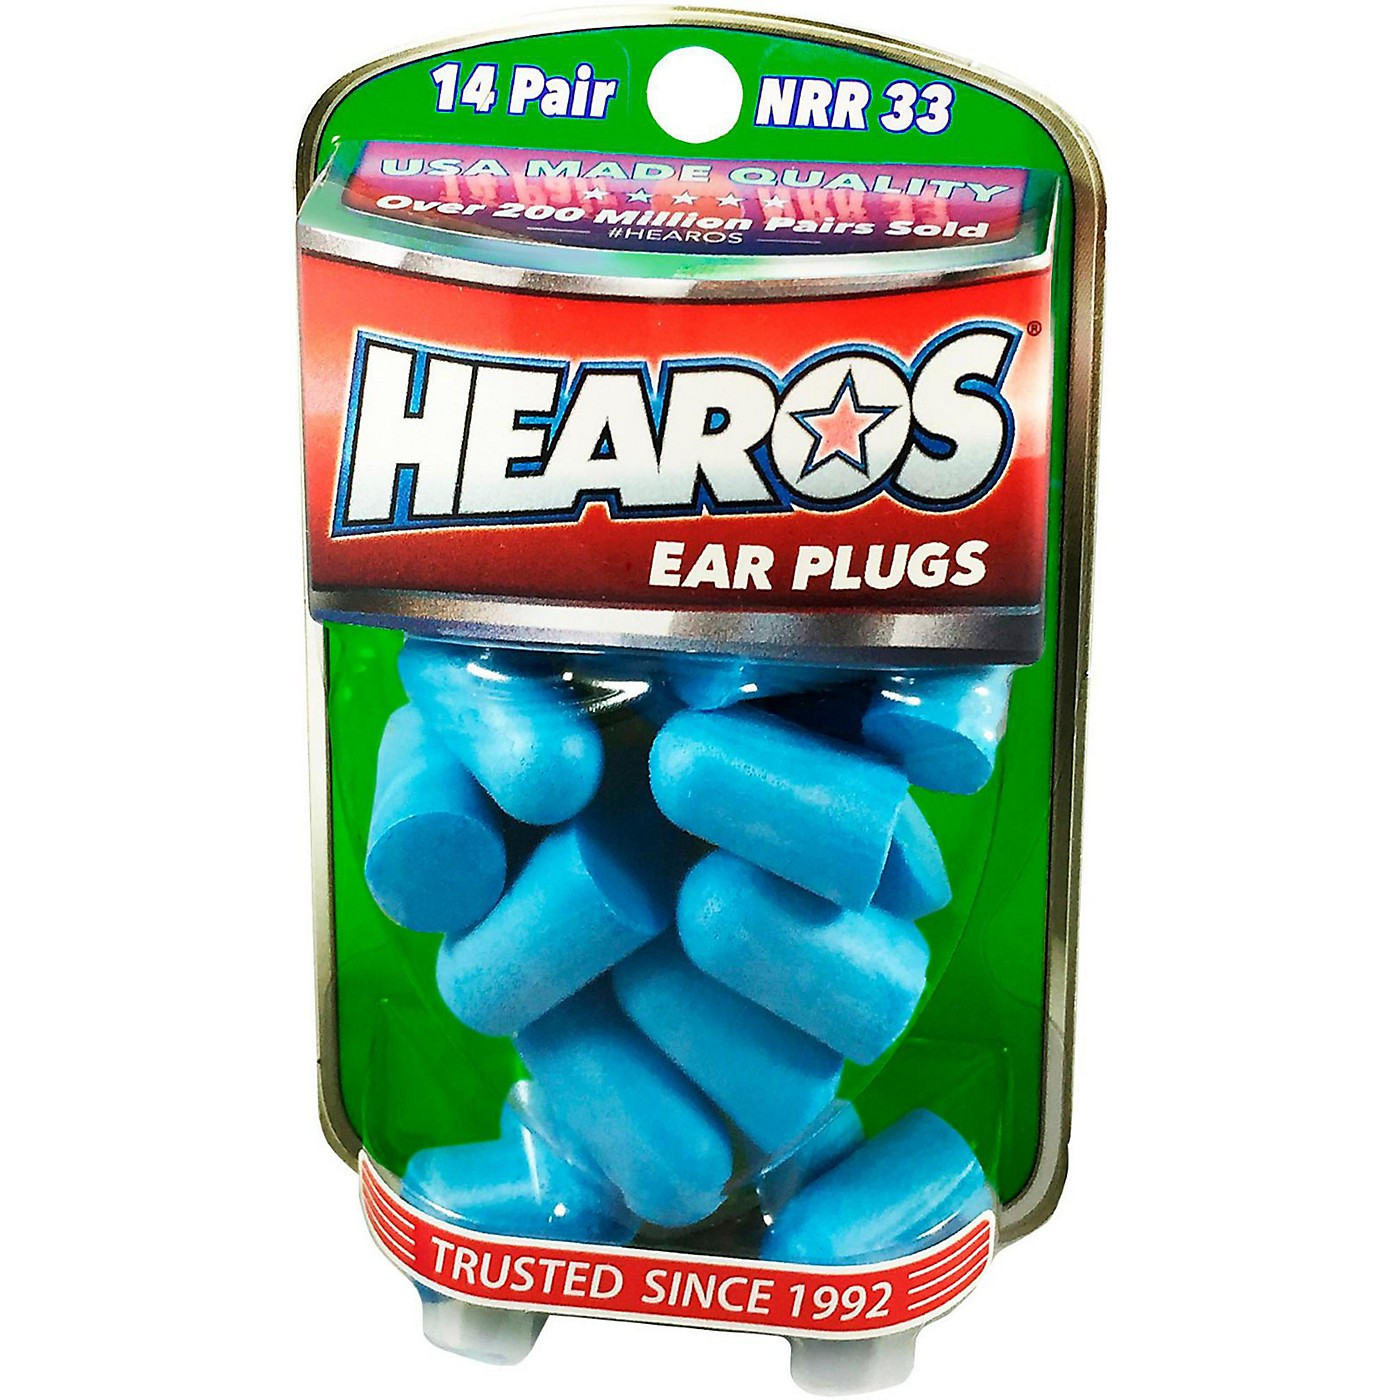 Hearos Xtreme Protection Series Ear Plugs 14-Pair thumbnail